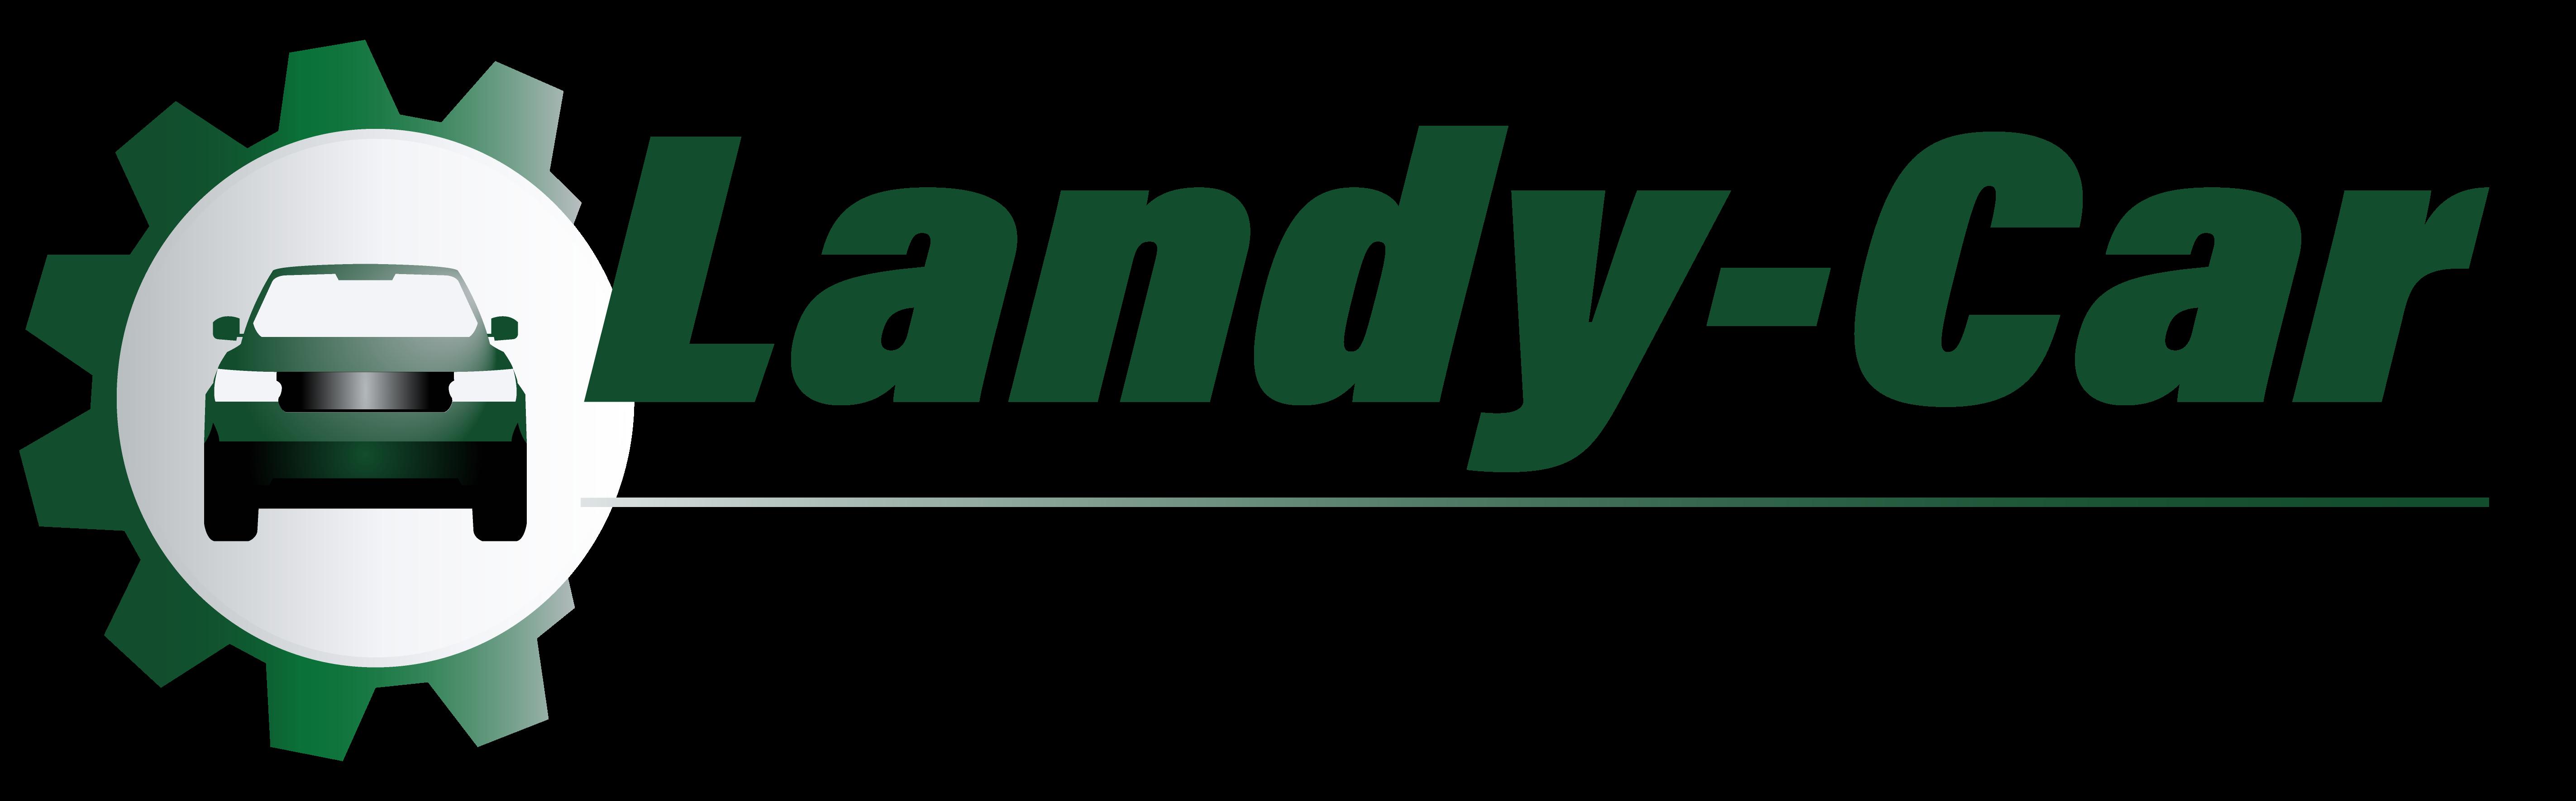 Landy-Car